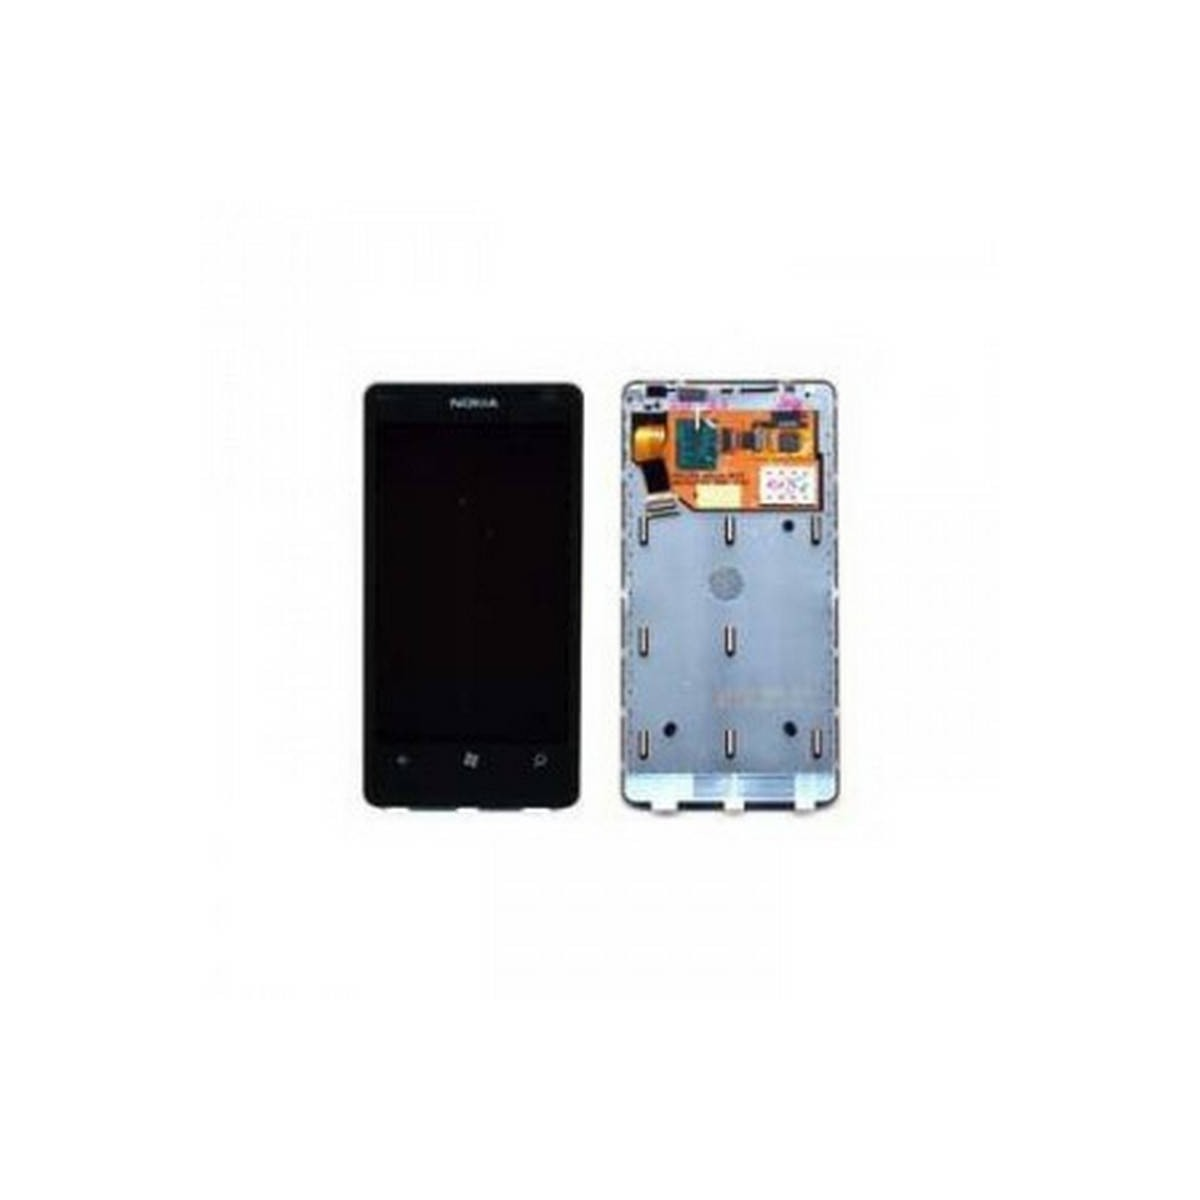 Ecrã Completa para Nokia Lumia 800